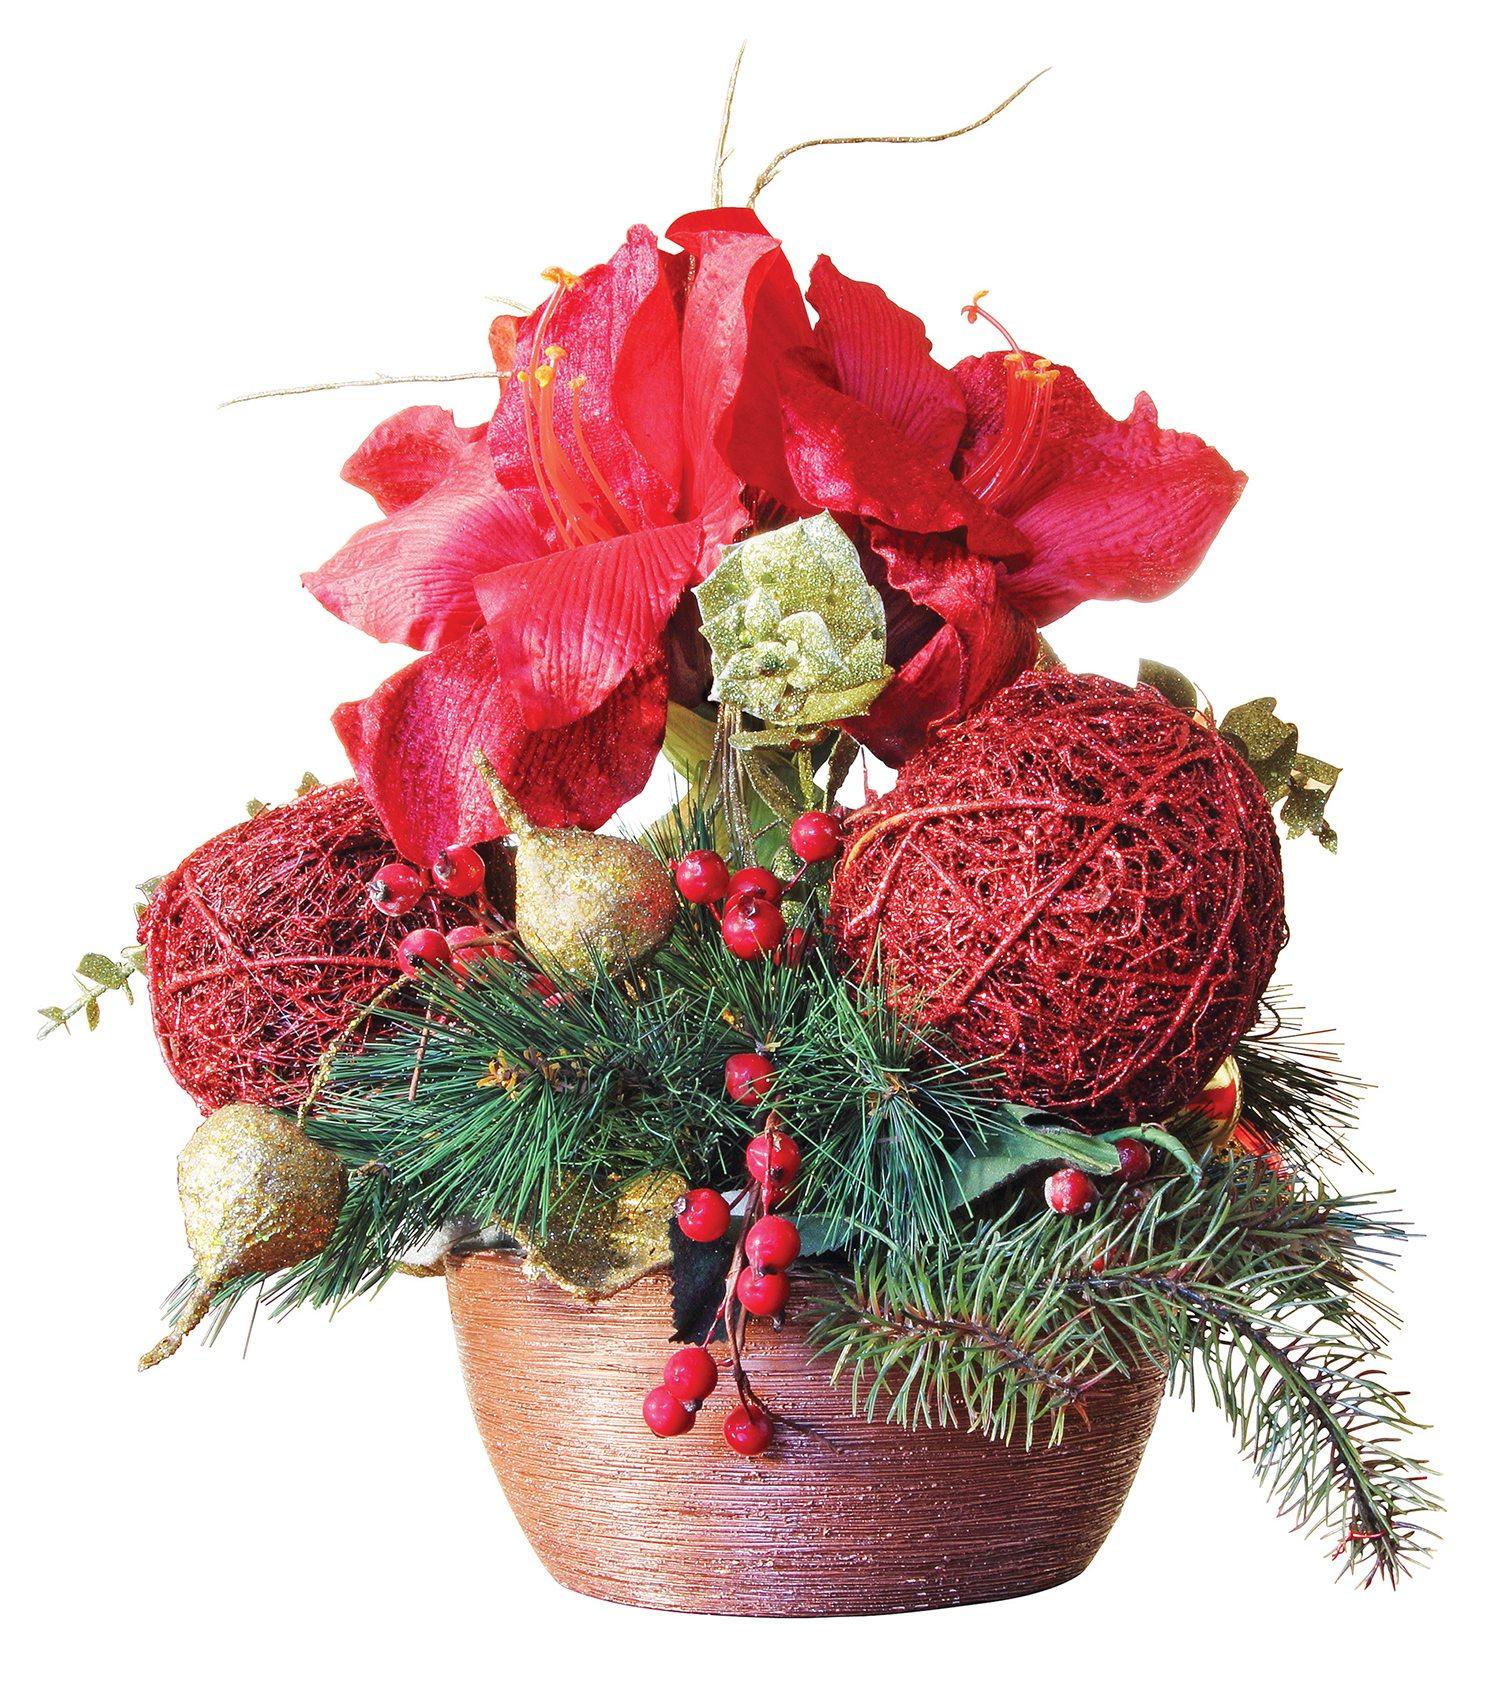 Beautiful Christmas flower arrangement isolated on white background